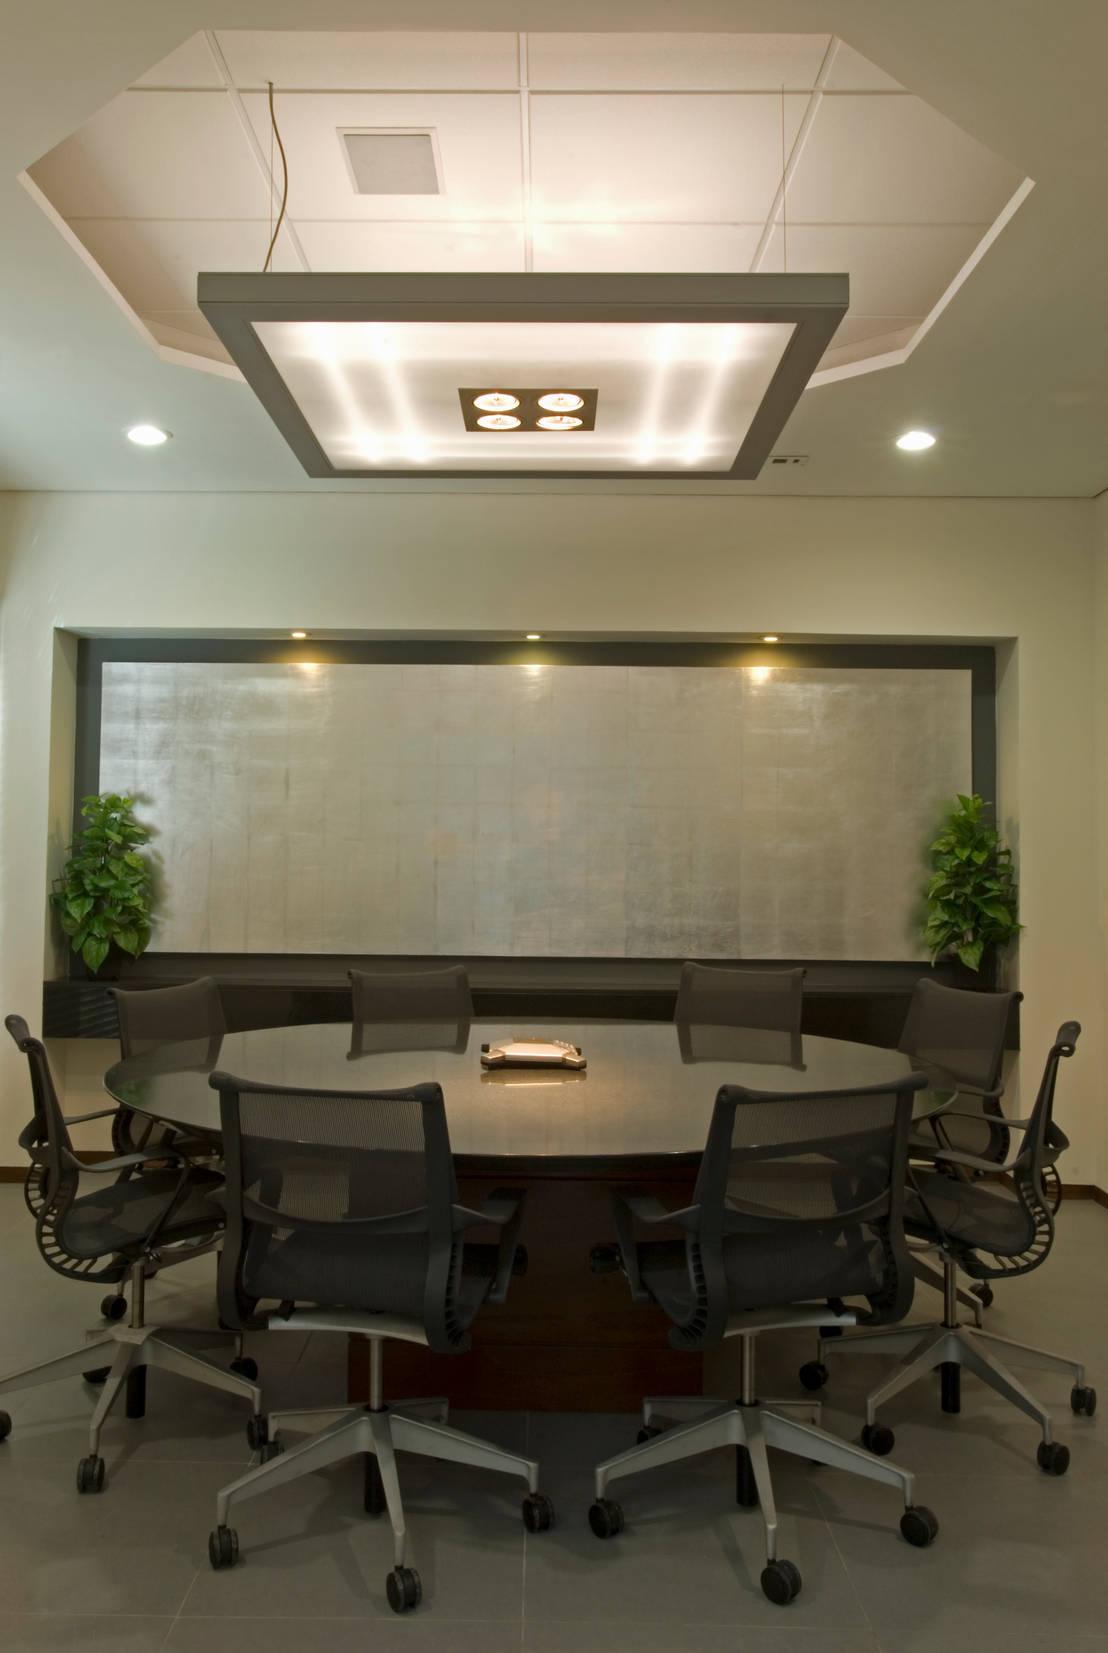 Oficinas imec de victoria plasencia interiorismo homify for Interiorismo oficinas